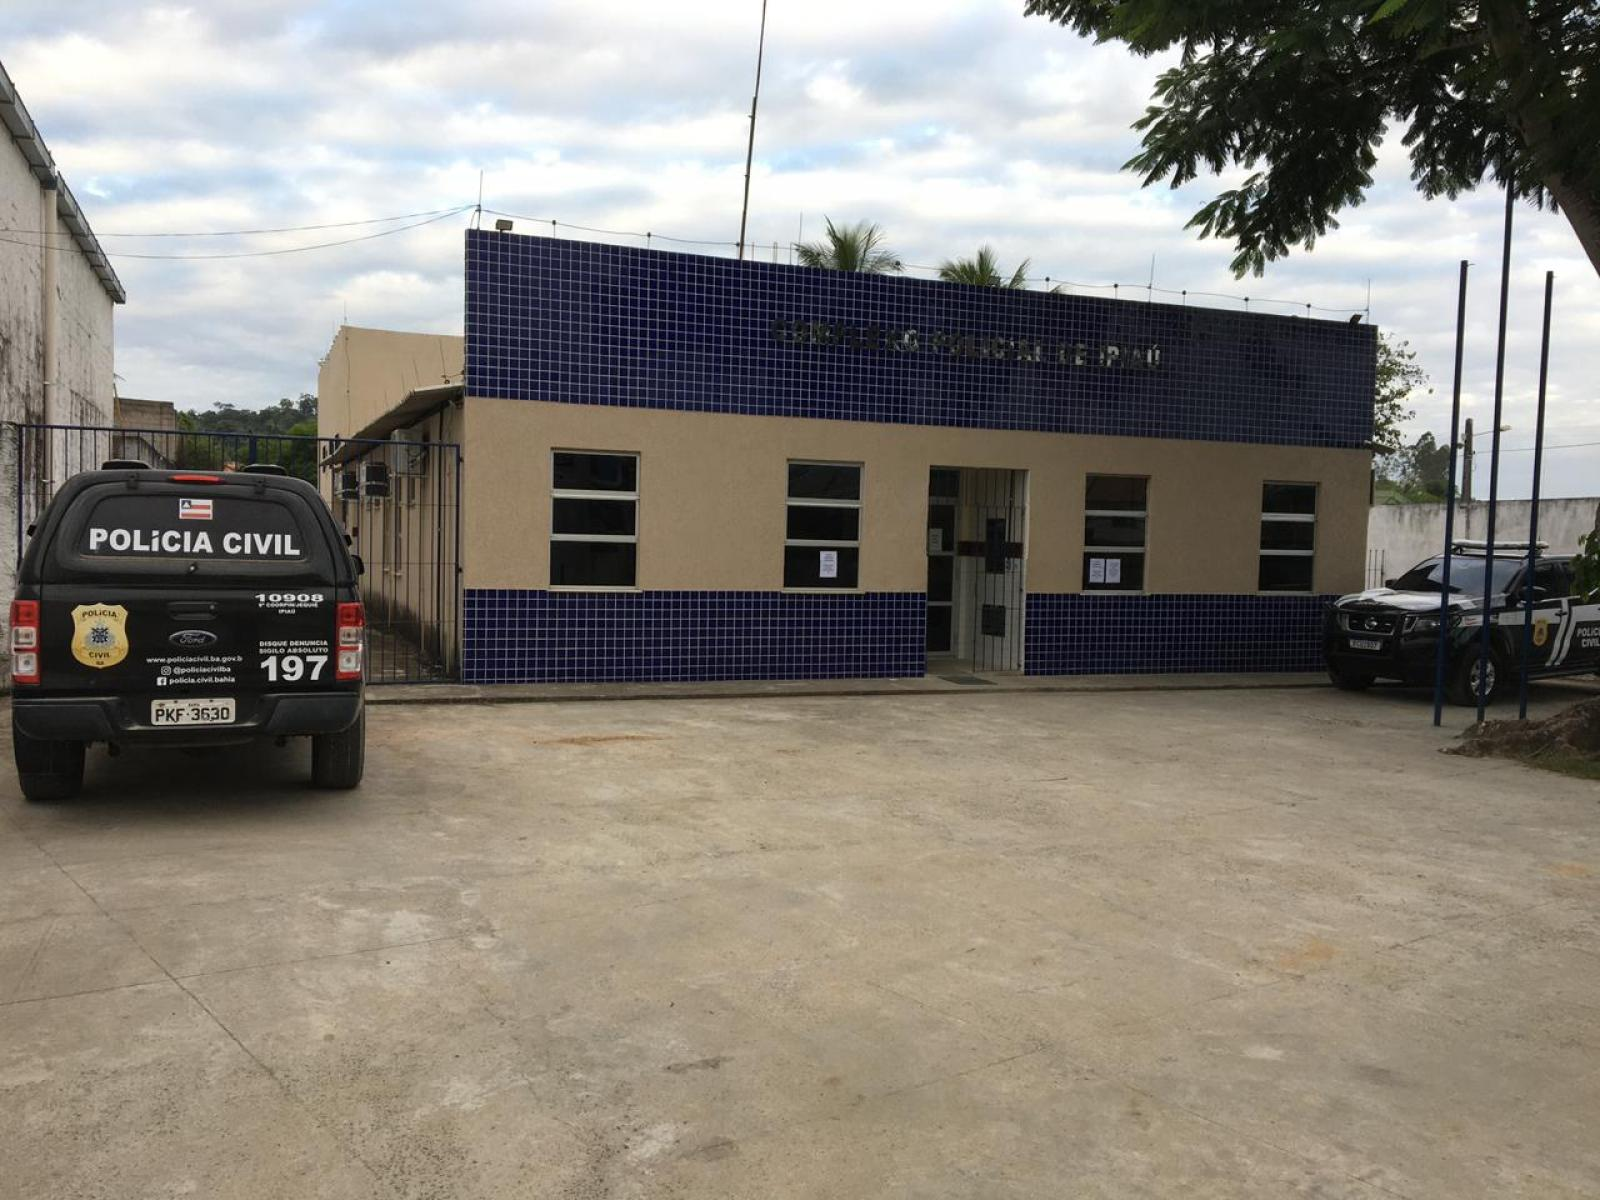 Ipiaú: Polícia Civil identificou autor de homicídio